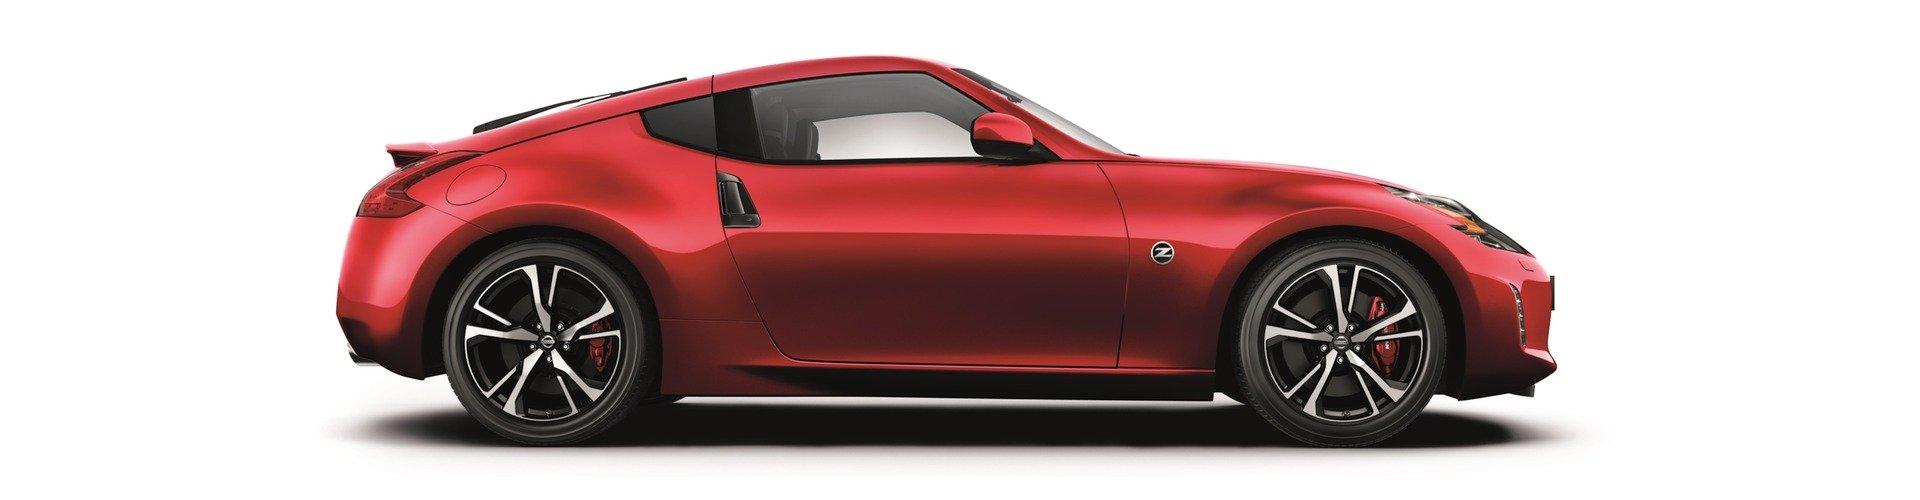 Nissan 370Z Facelift 2018